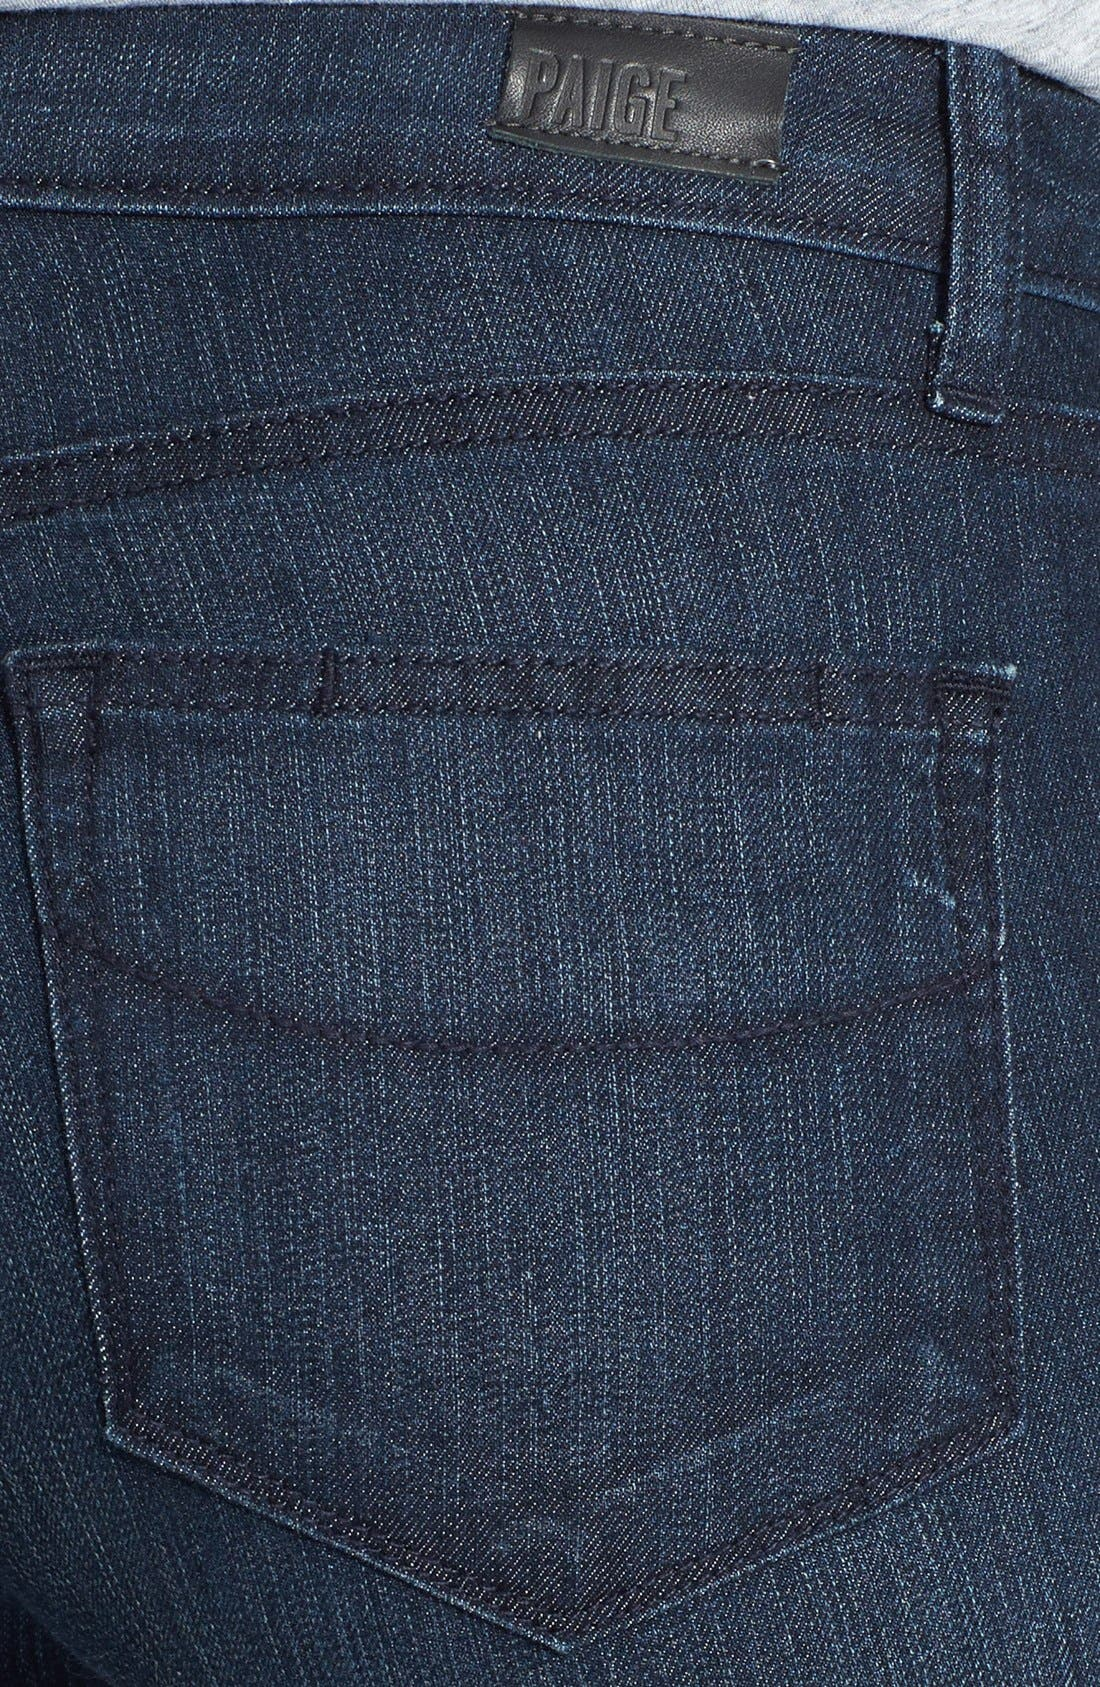 Alternate Image 3  - Paige Denim 'Skyline' Straight Leg Jeans (Manchester) (Petite)